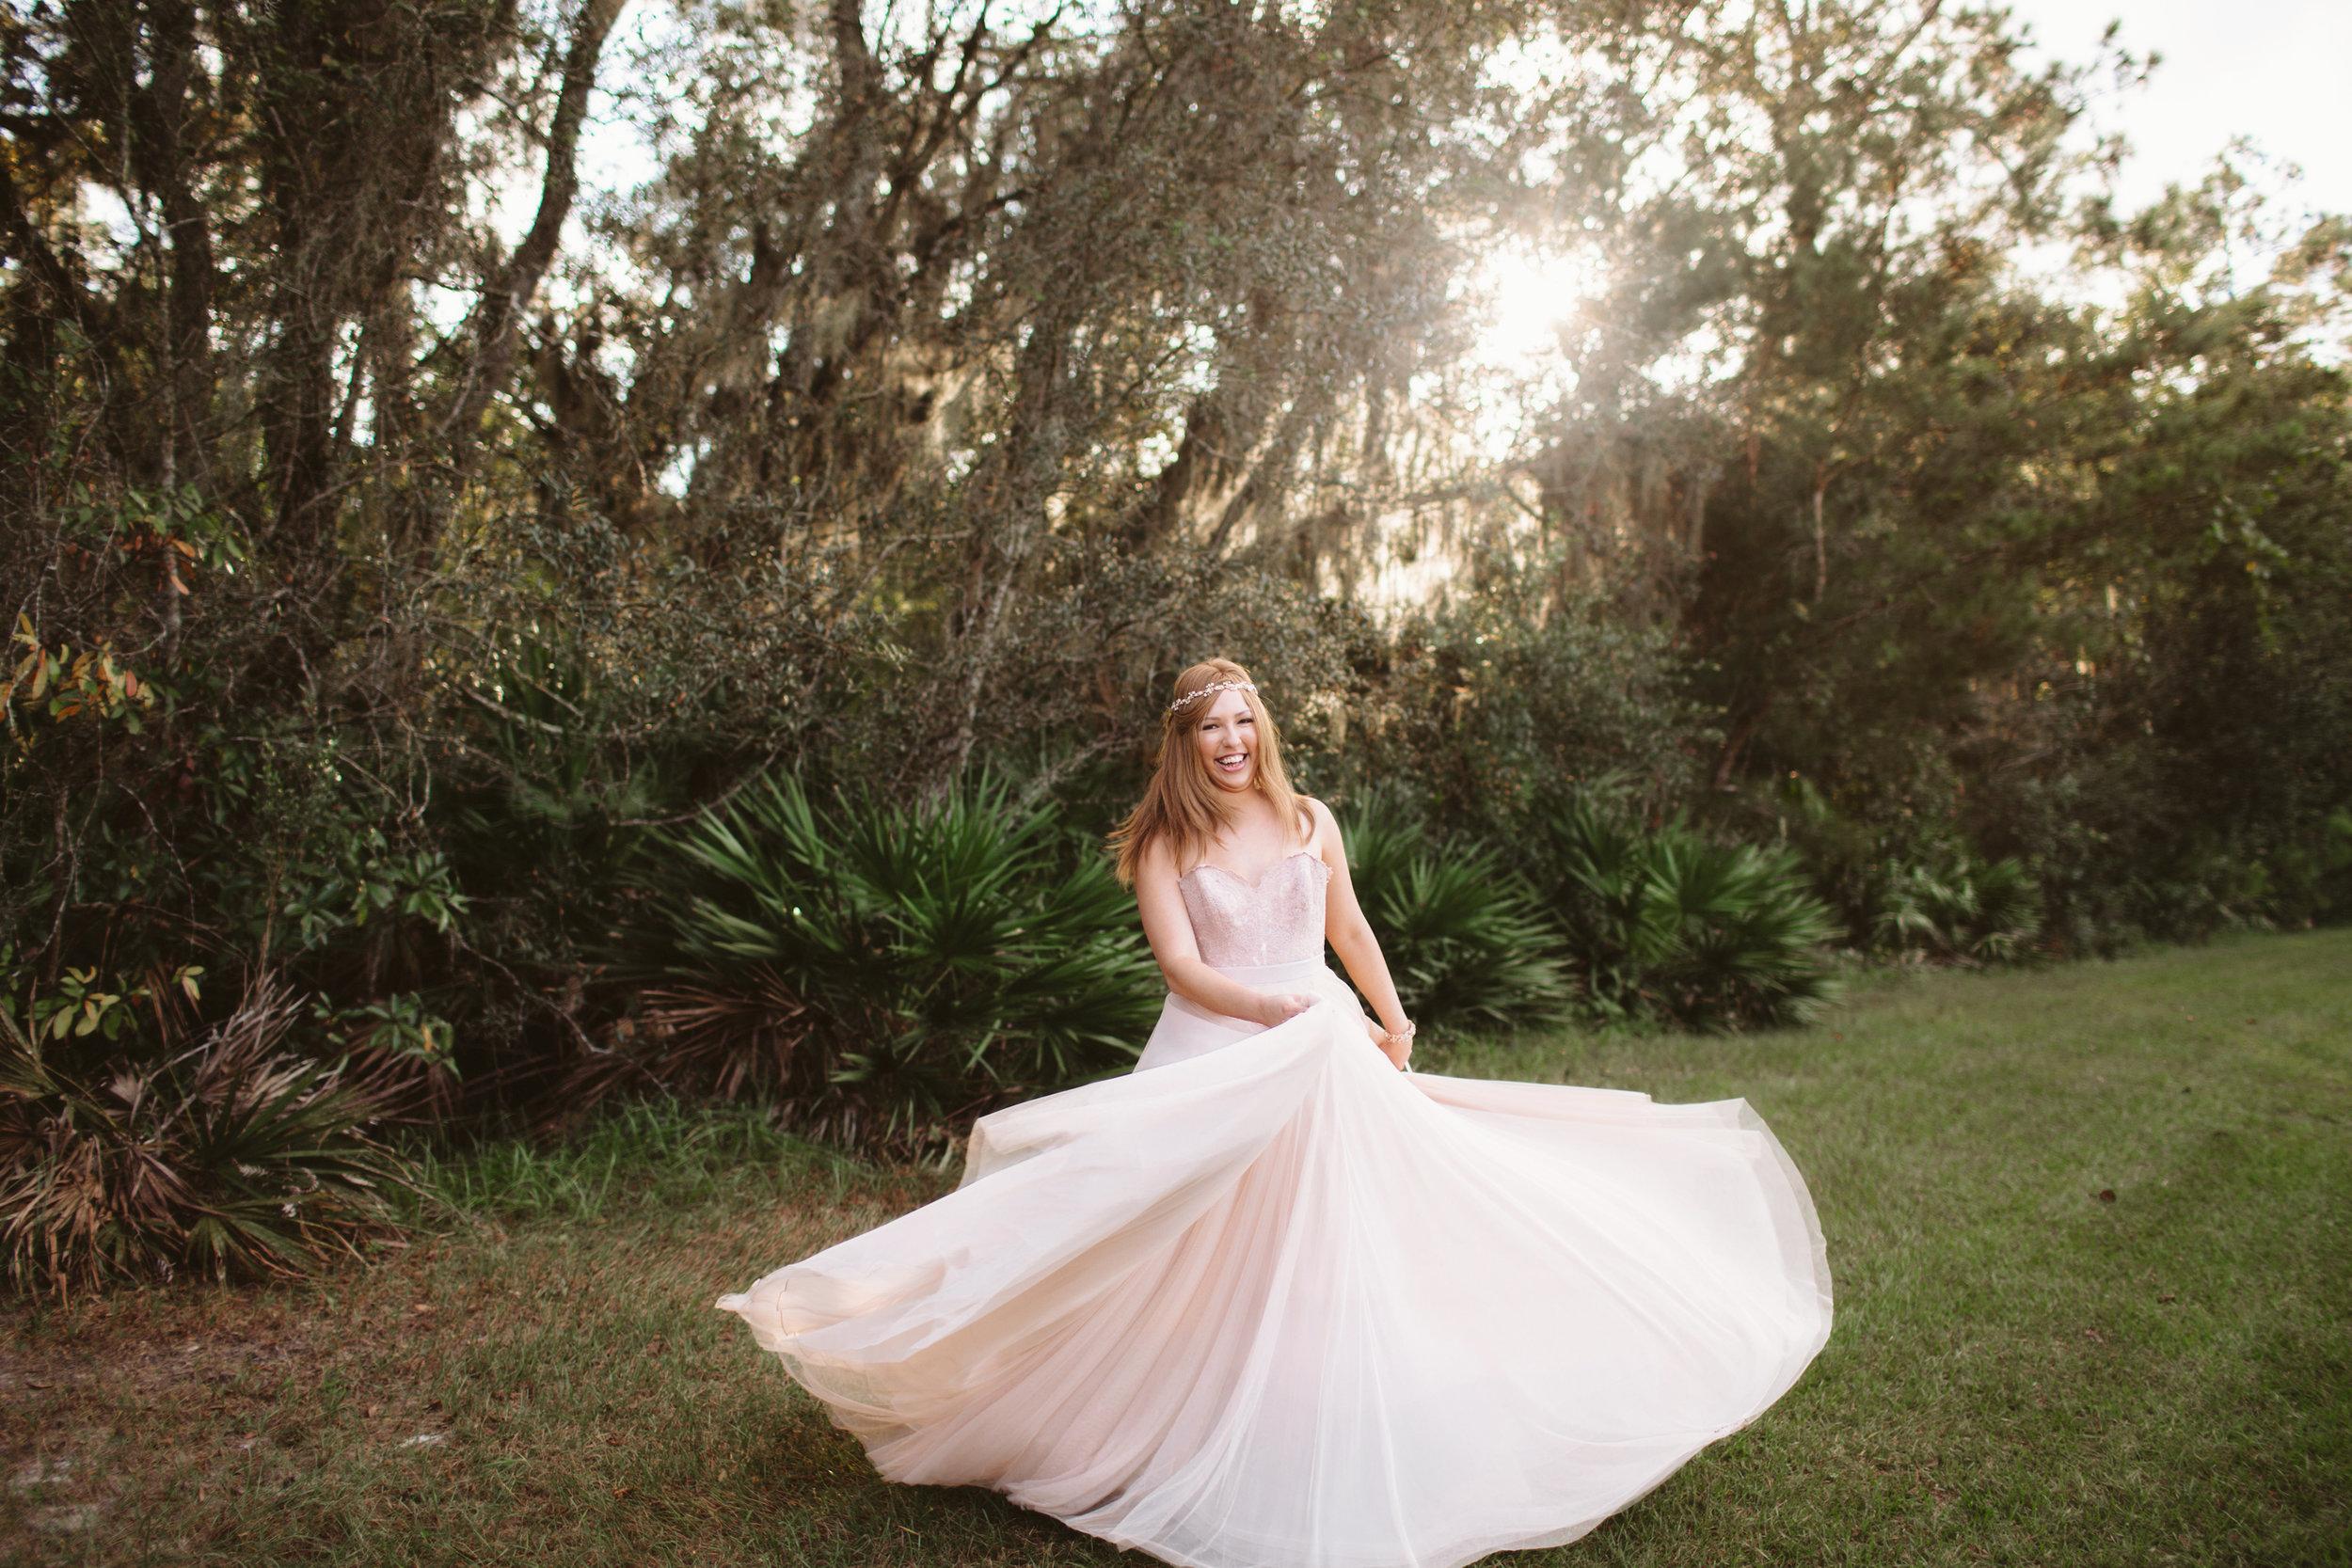 Breast Cancer awareness | Solutions bridal | Waterswoo | Vanessa Boy | vanessaboy.com |-380.com |final.jpg